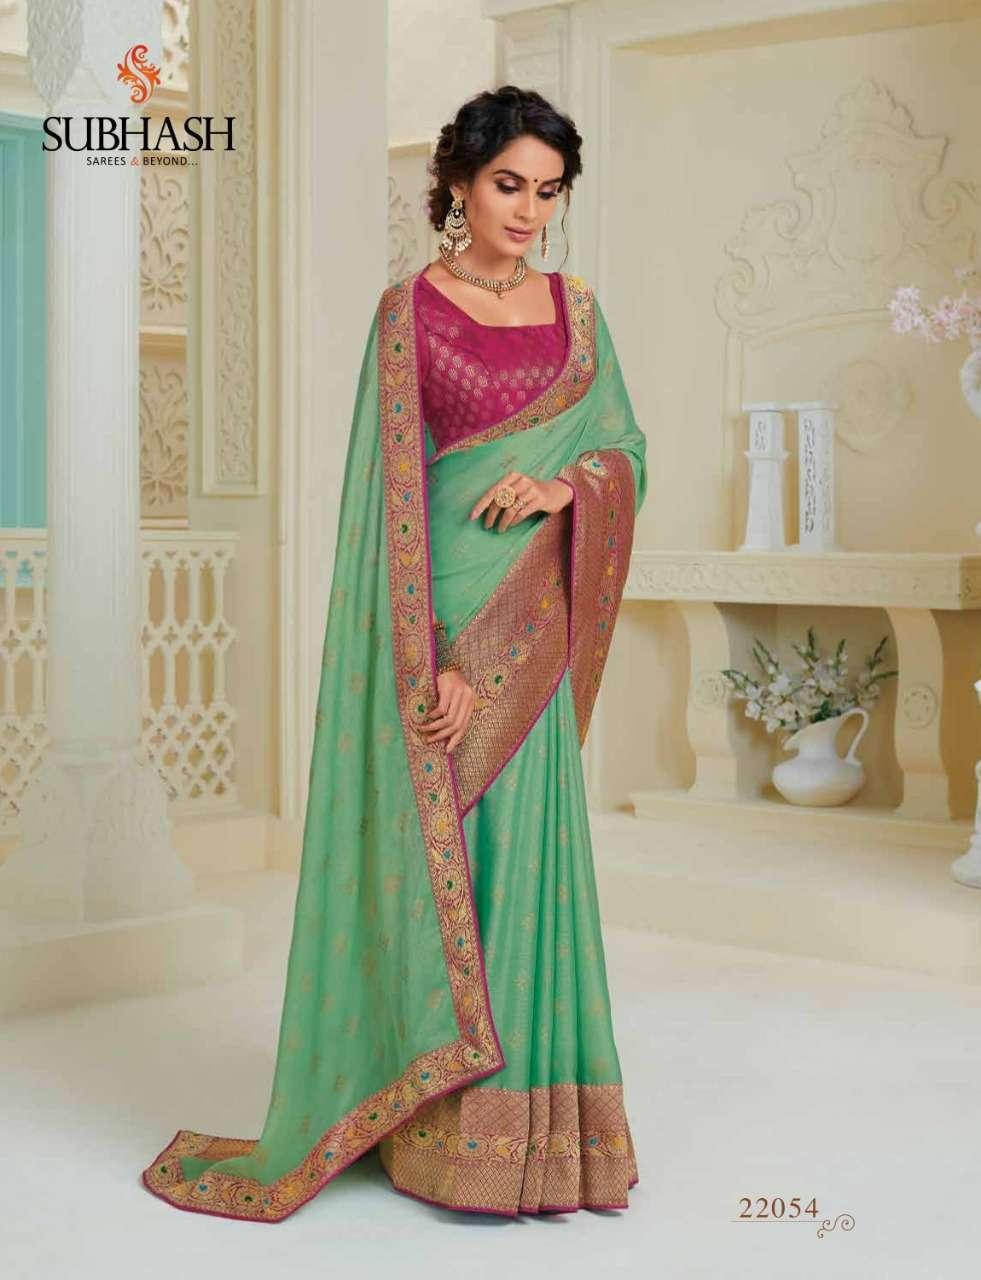 Subhash Manjri Fancy Designer Party Wear Sarees Collection 04